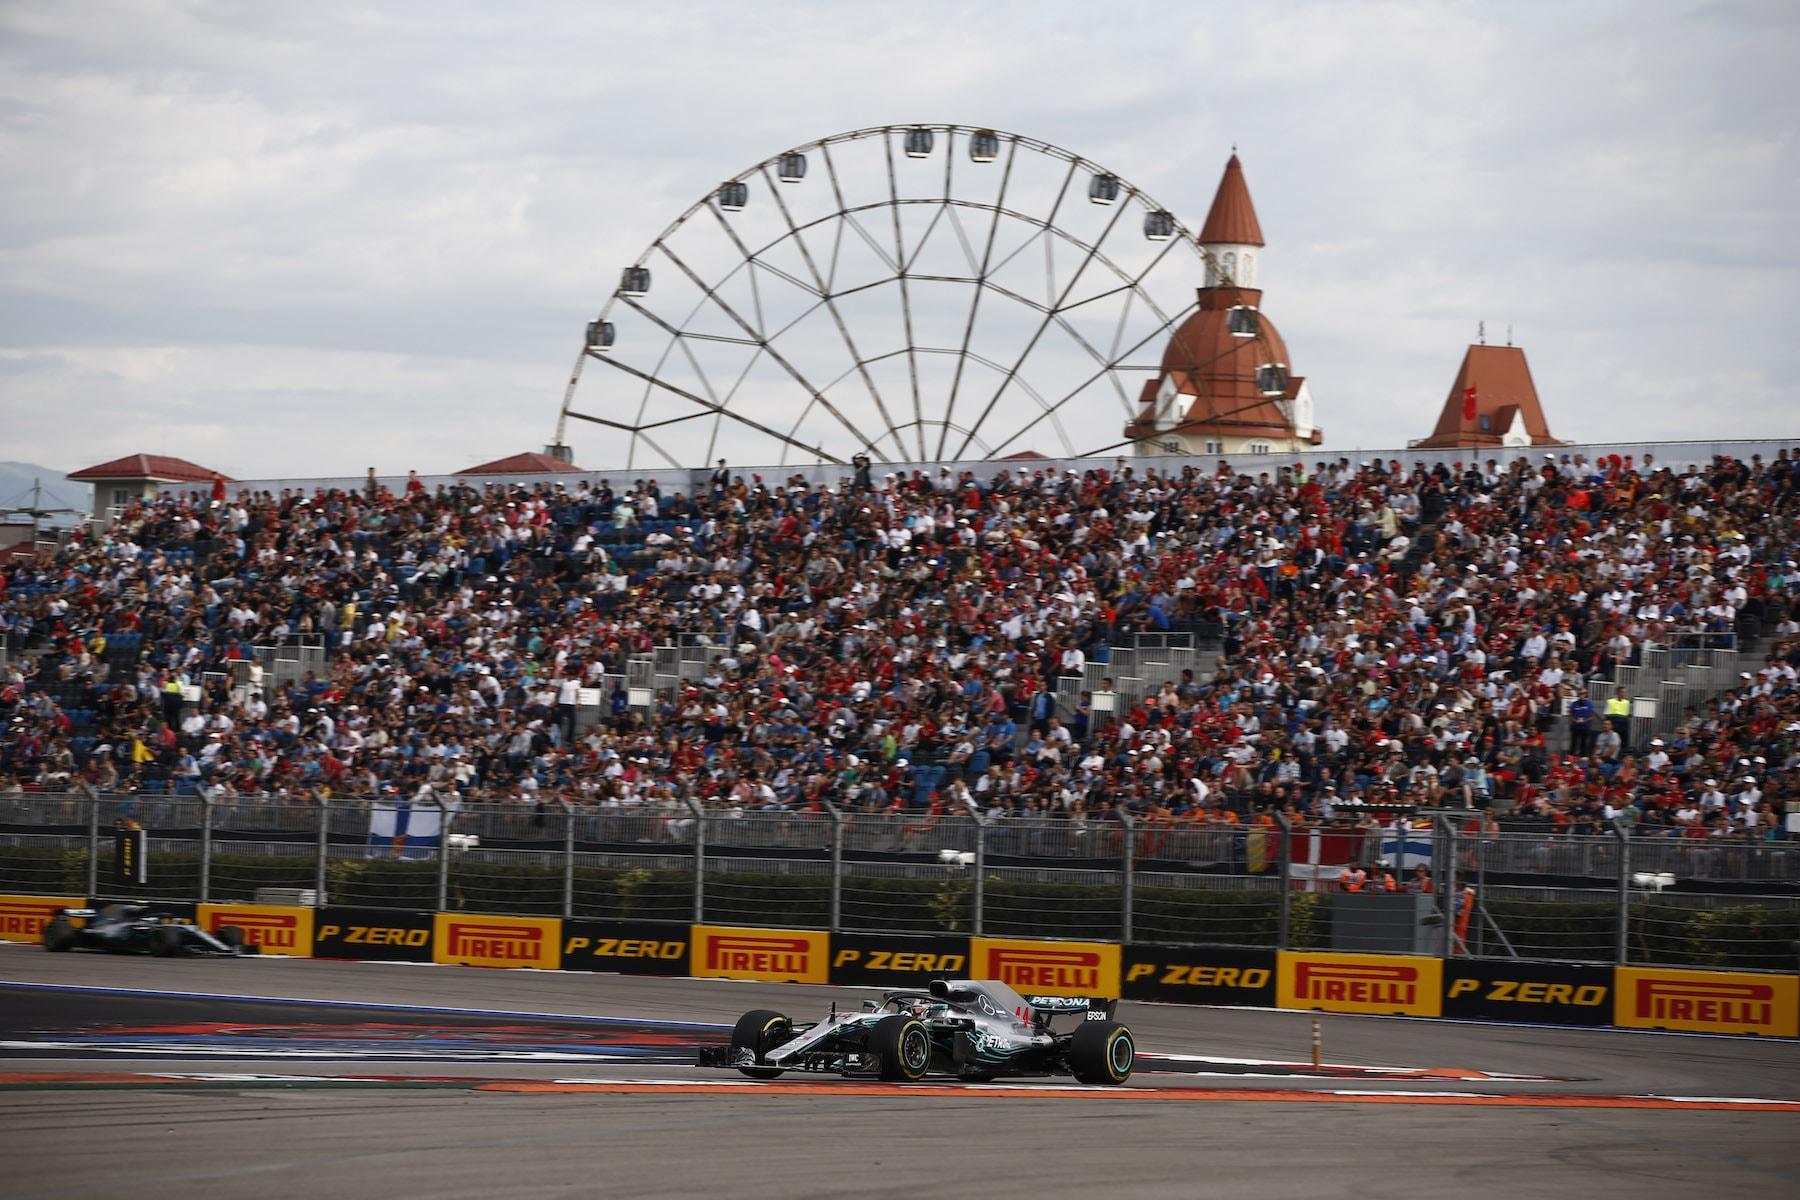 T 2018 Lewis Hamilton | Mercedes W09 | 2018 Russian GP winner 4 copy.jpg